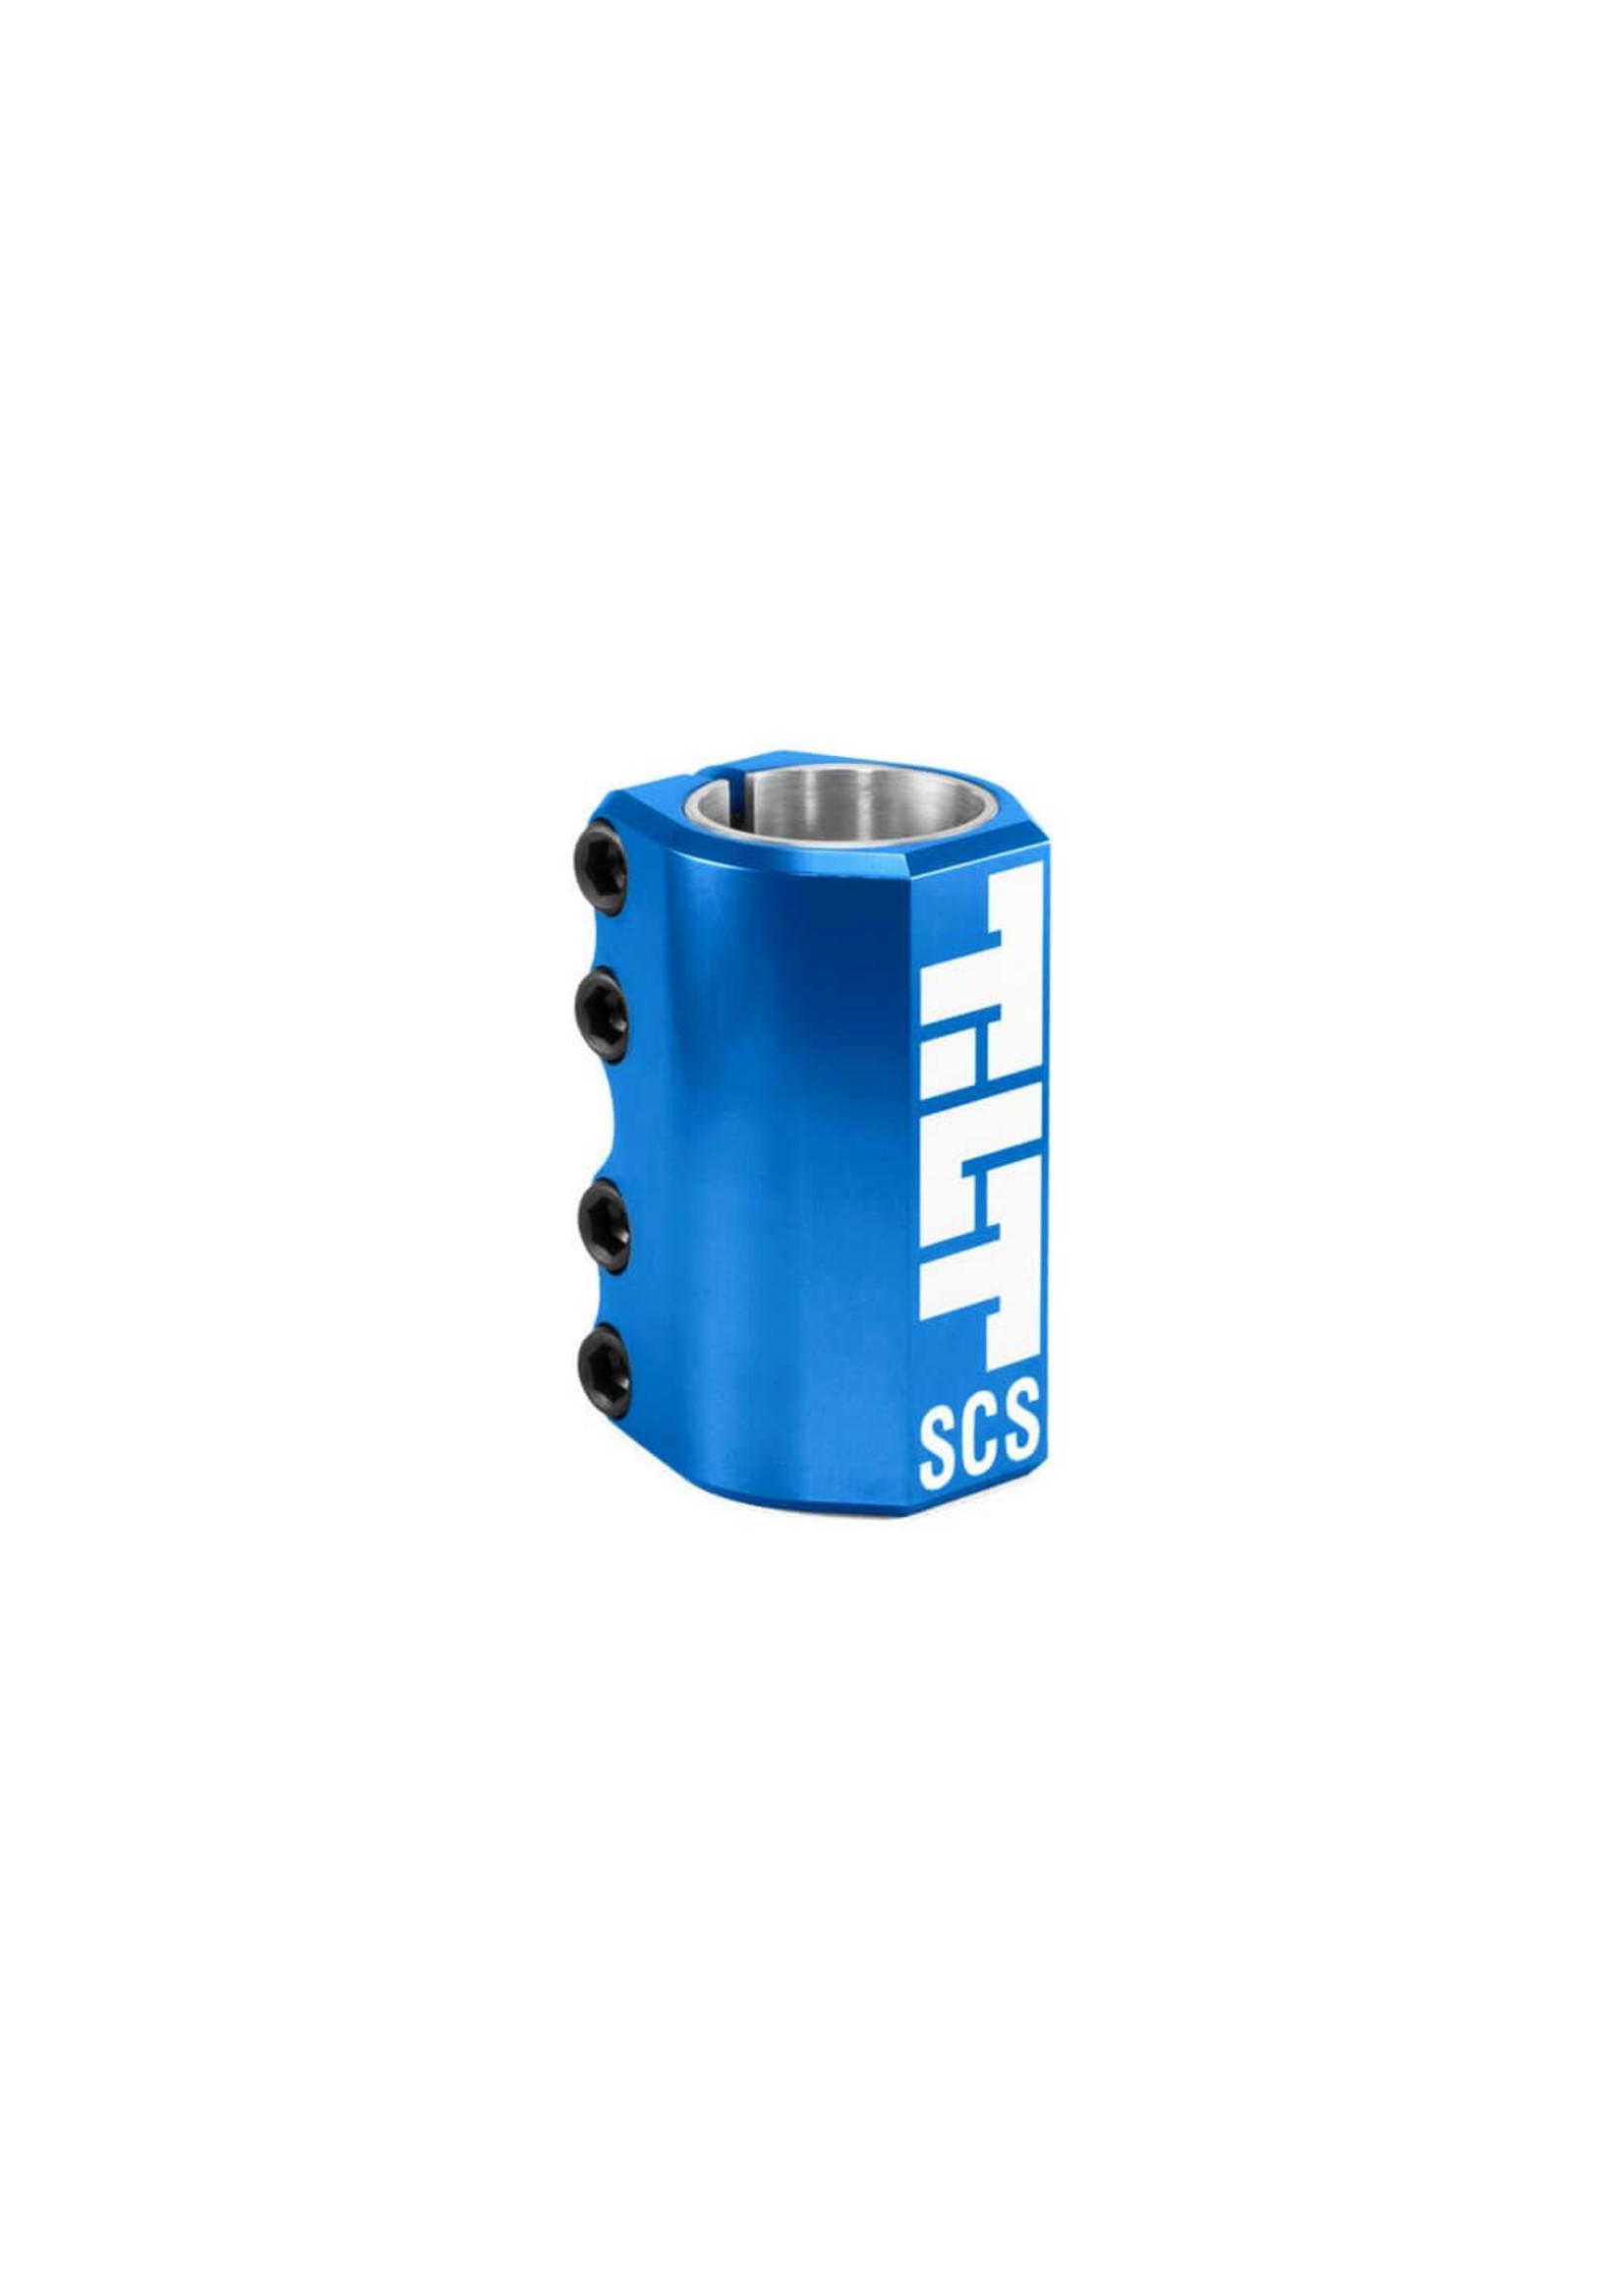 Tilt Tilt - Classic Clamp - SCS